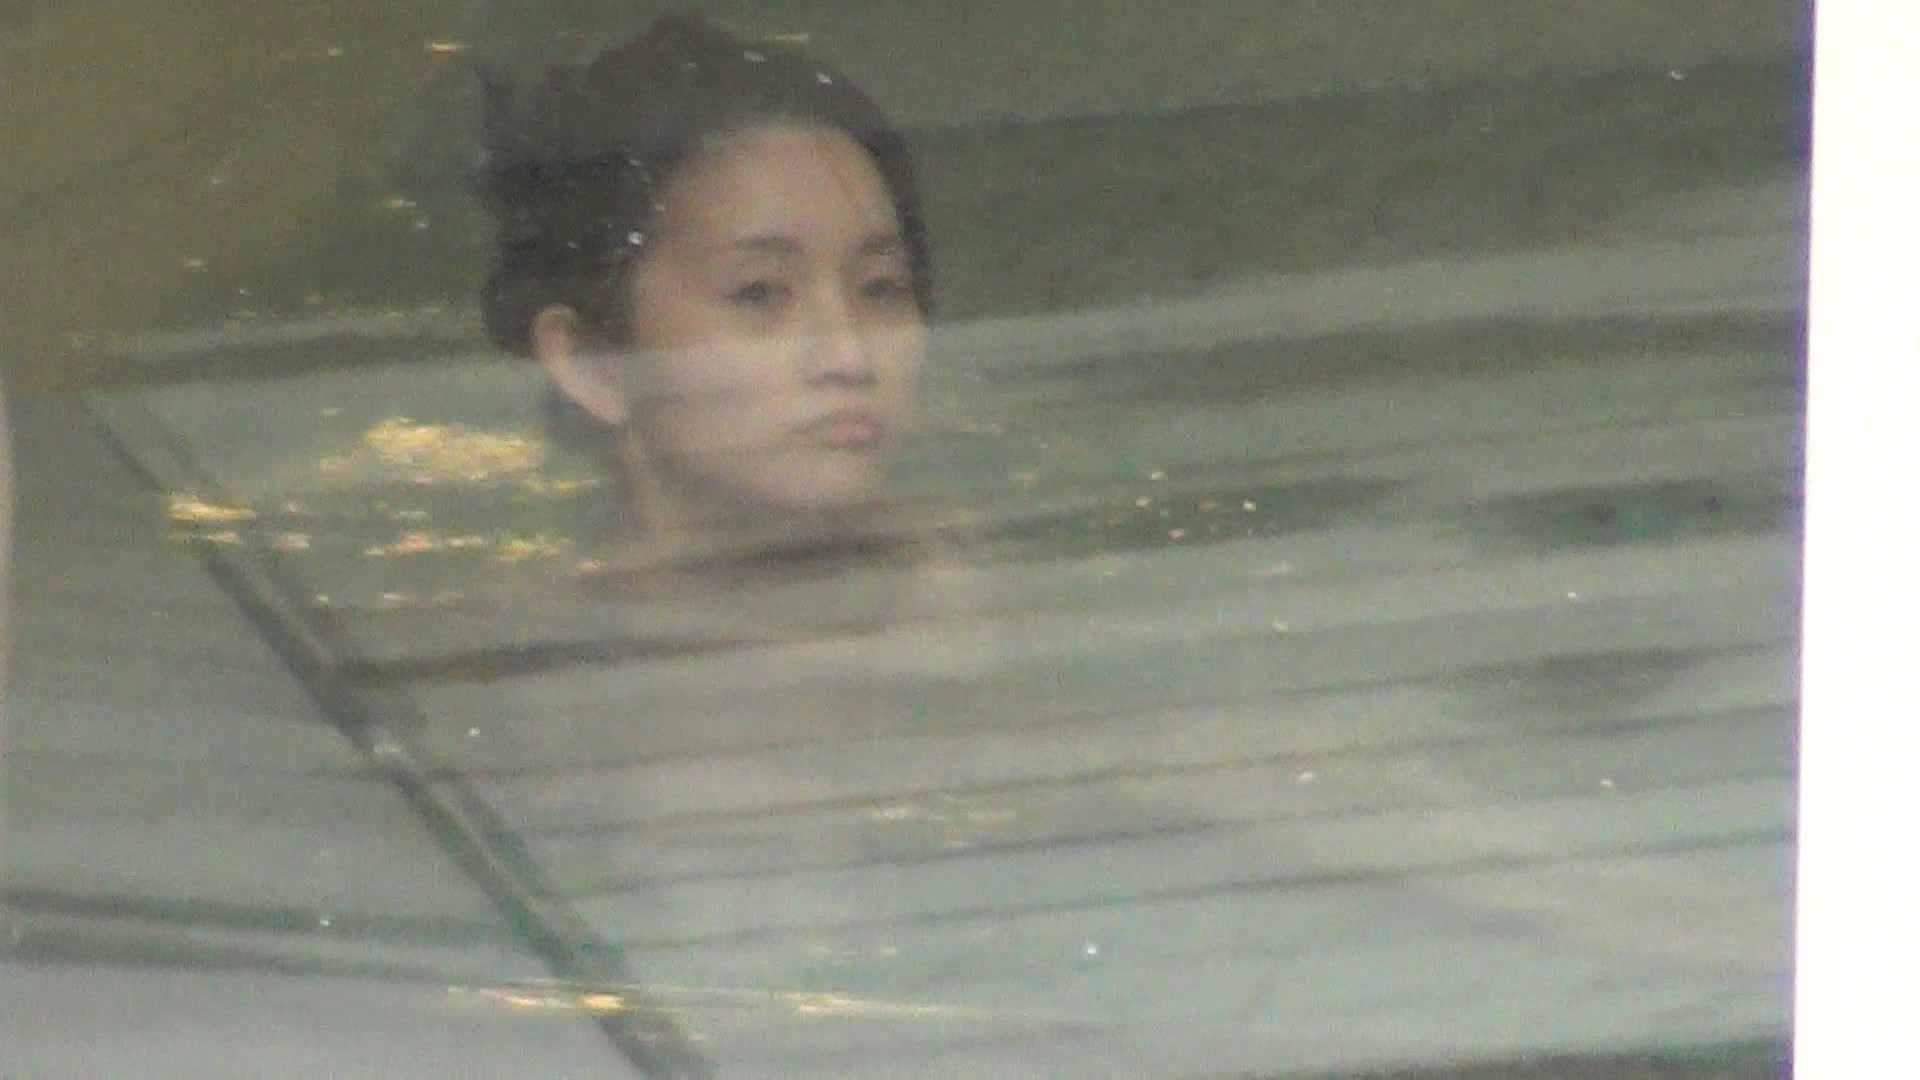 Aquaな露天風呂Vol.241 0  50連発 28